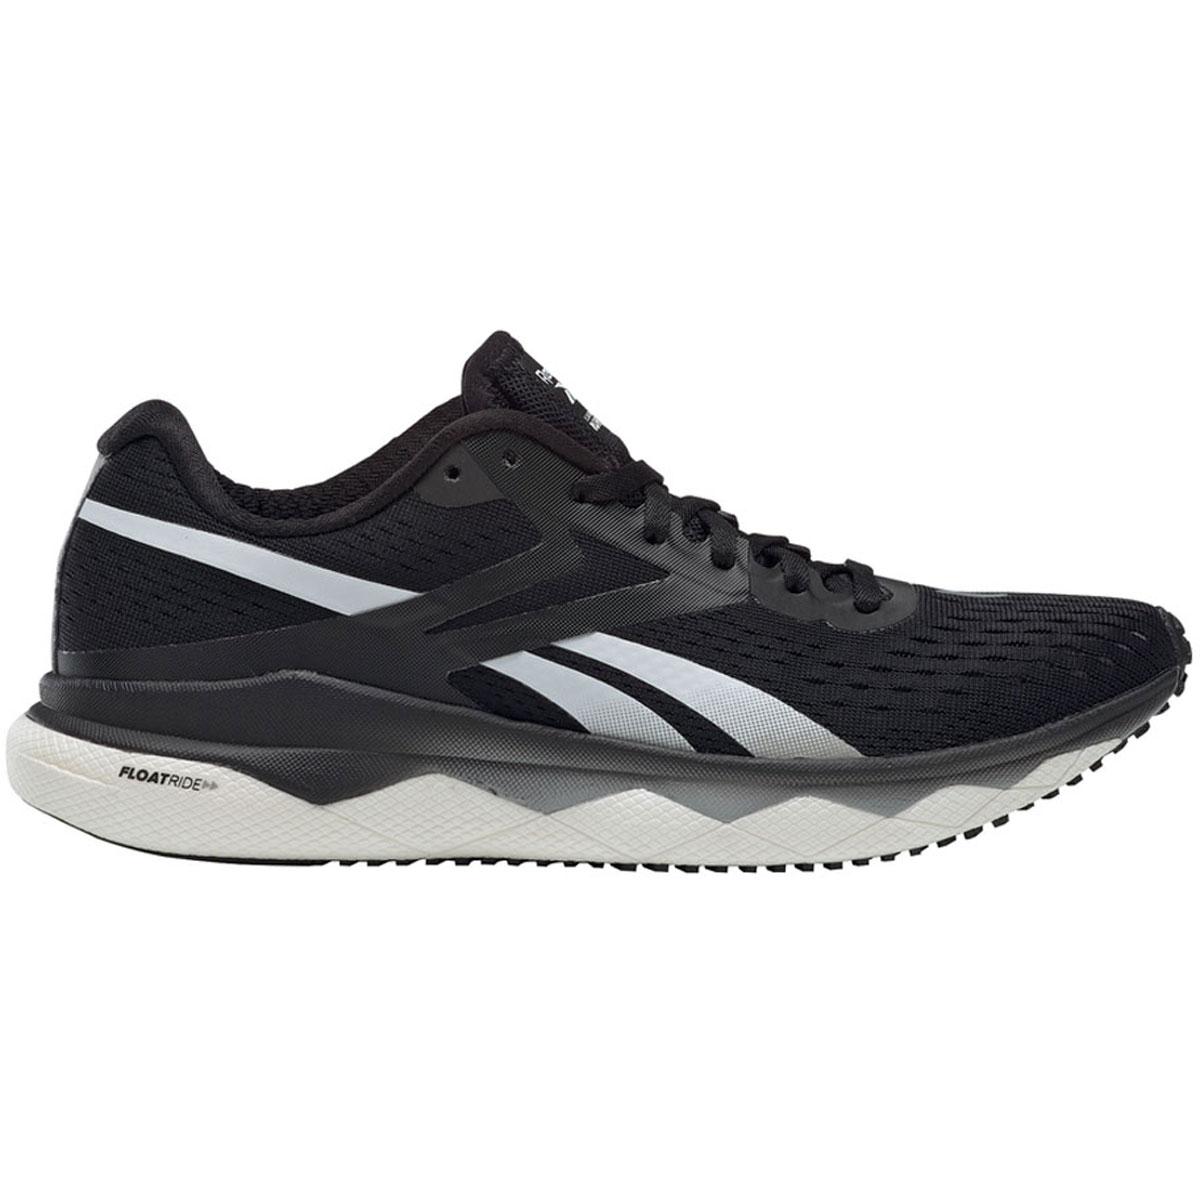 Women's Reebok Floatride Run Fast 2.0 Running Shoe - Color: Black/Pure Grey 3/White (Regular Width) - Size: 5, Black/Pure Grey 3/White, large, image 1